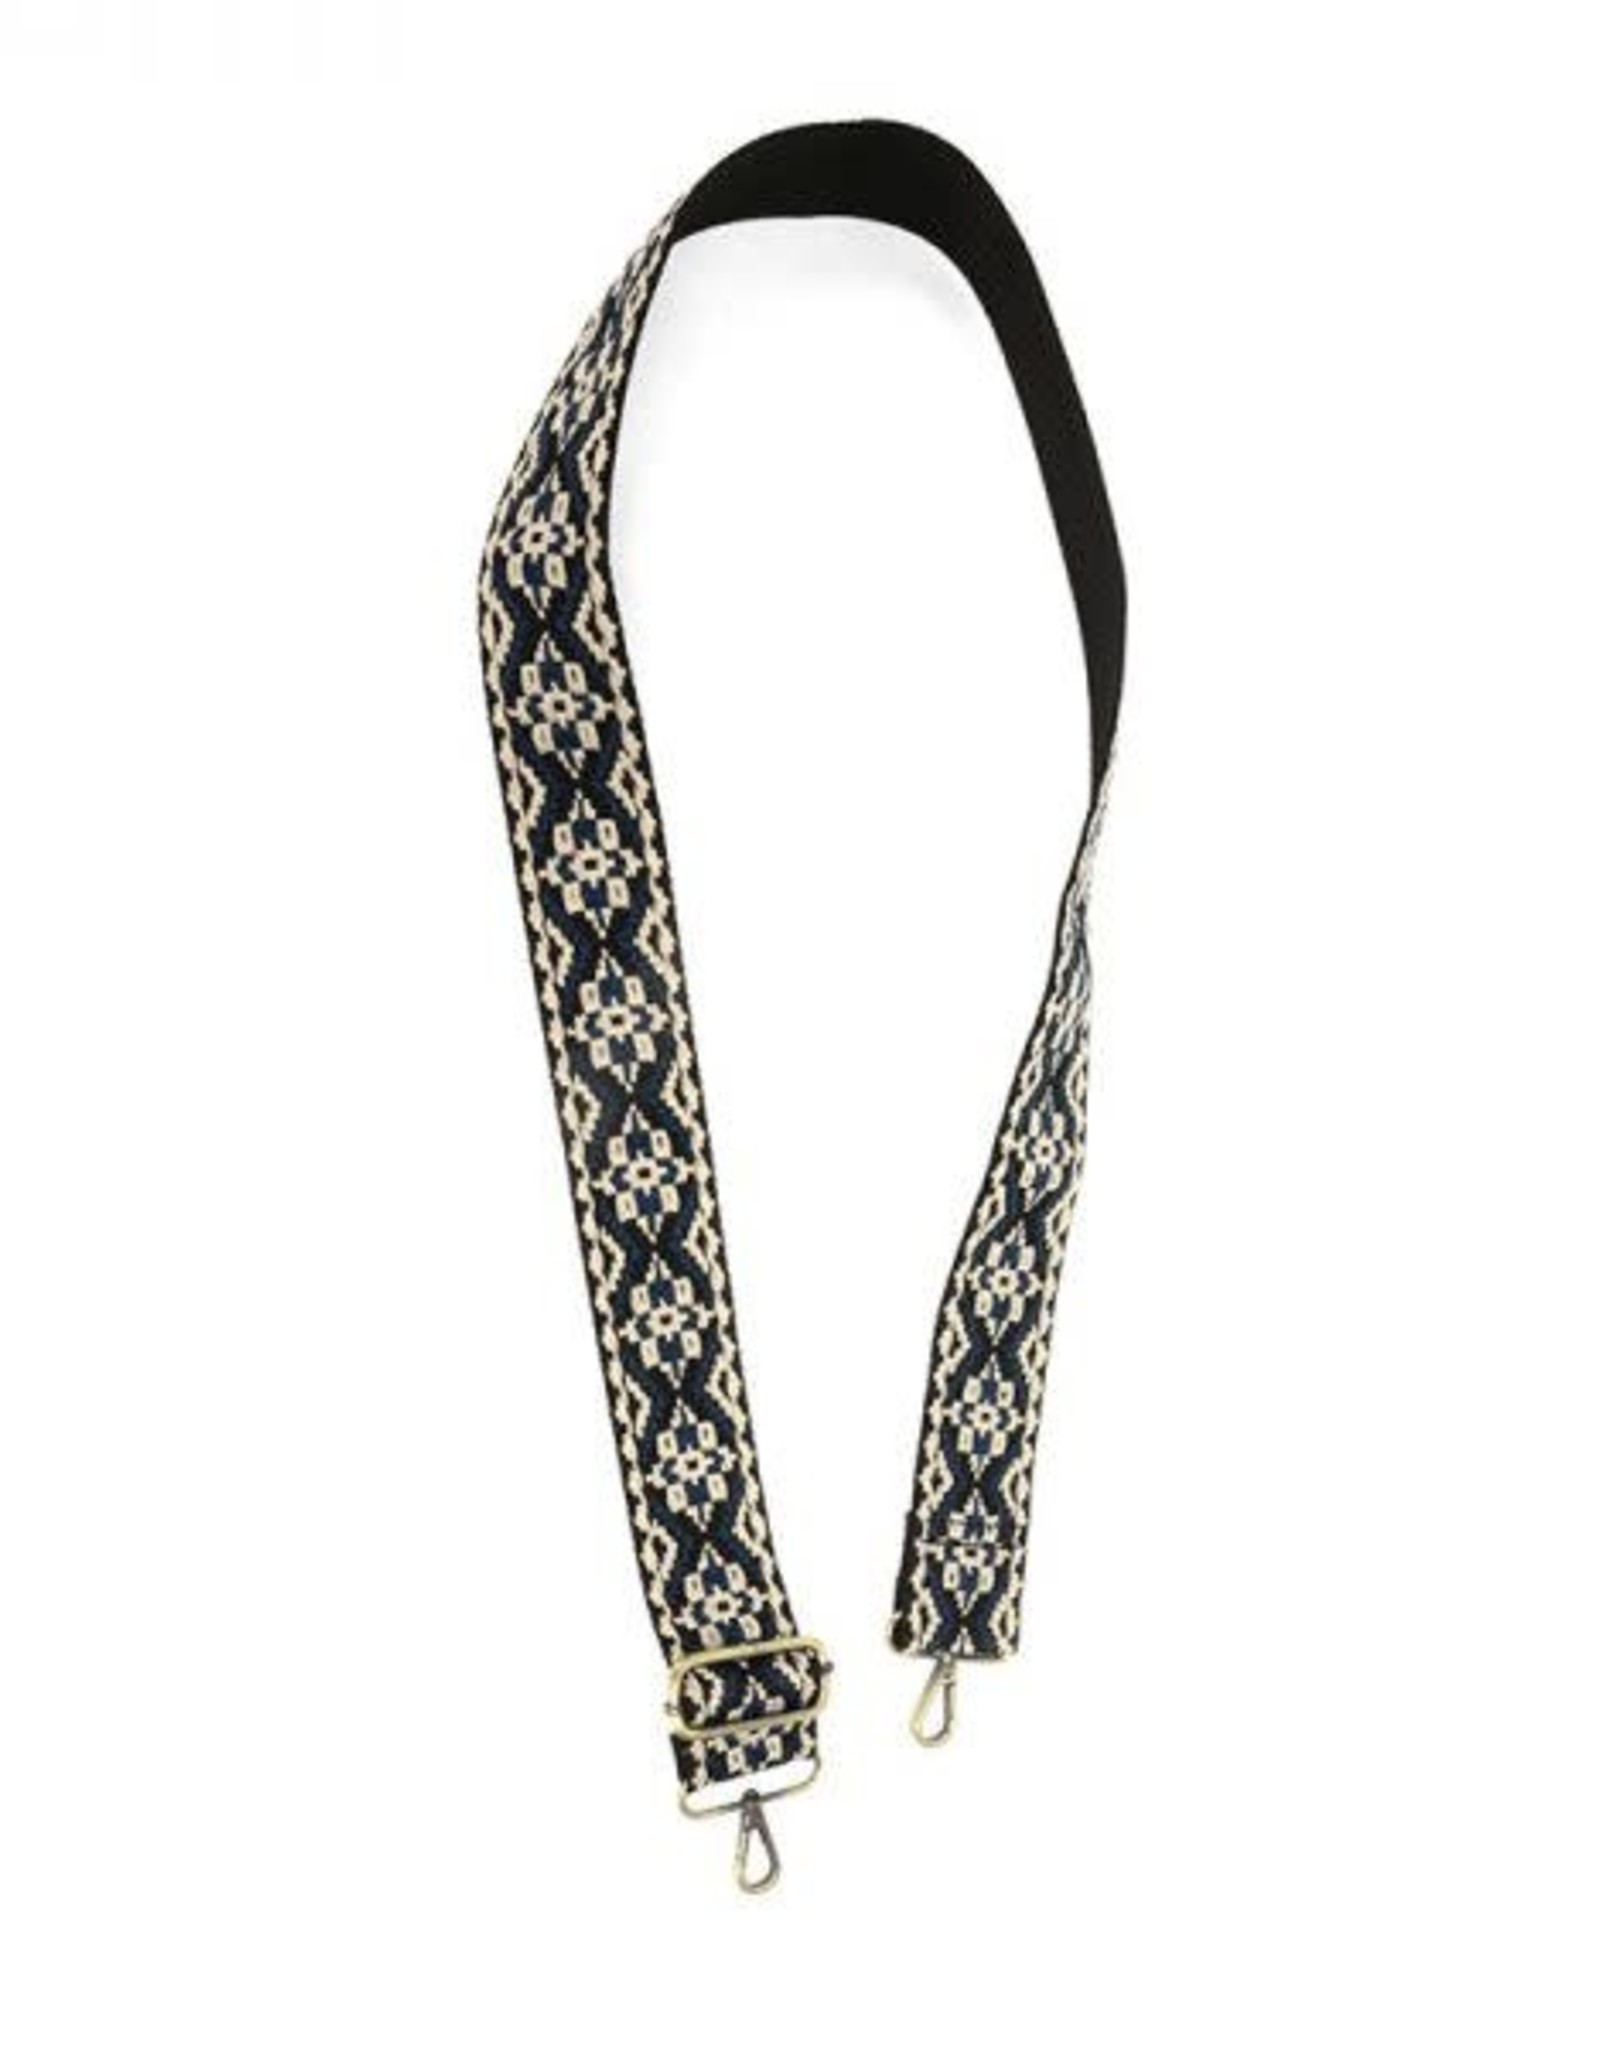 Joy Susan Accessories Embroidered Handbag Guitar Straps